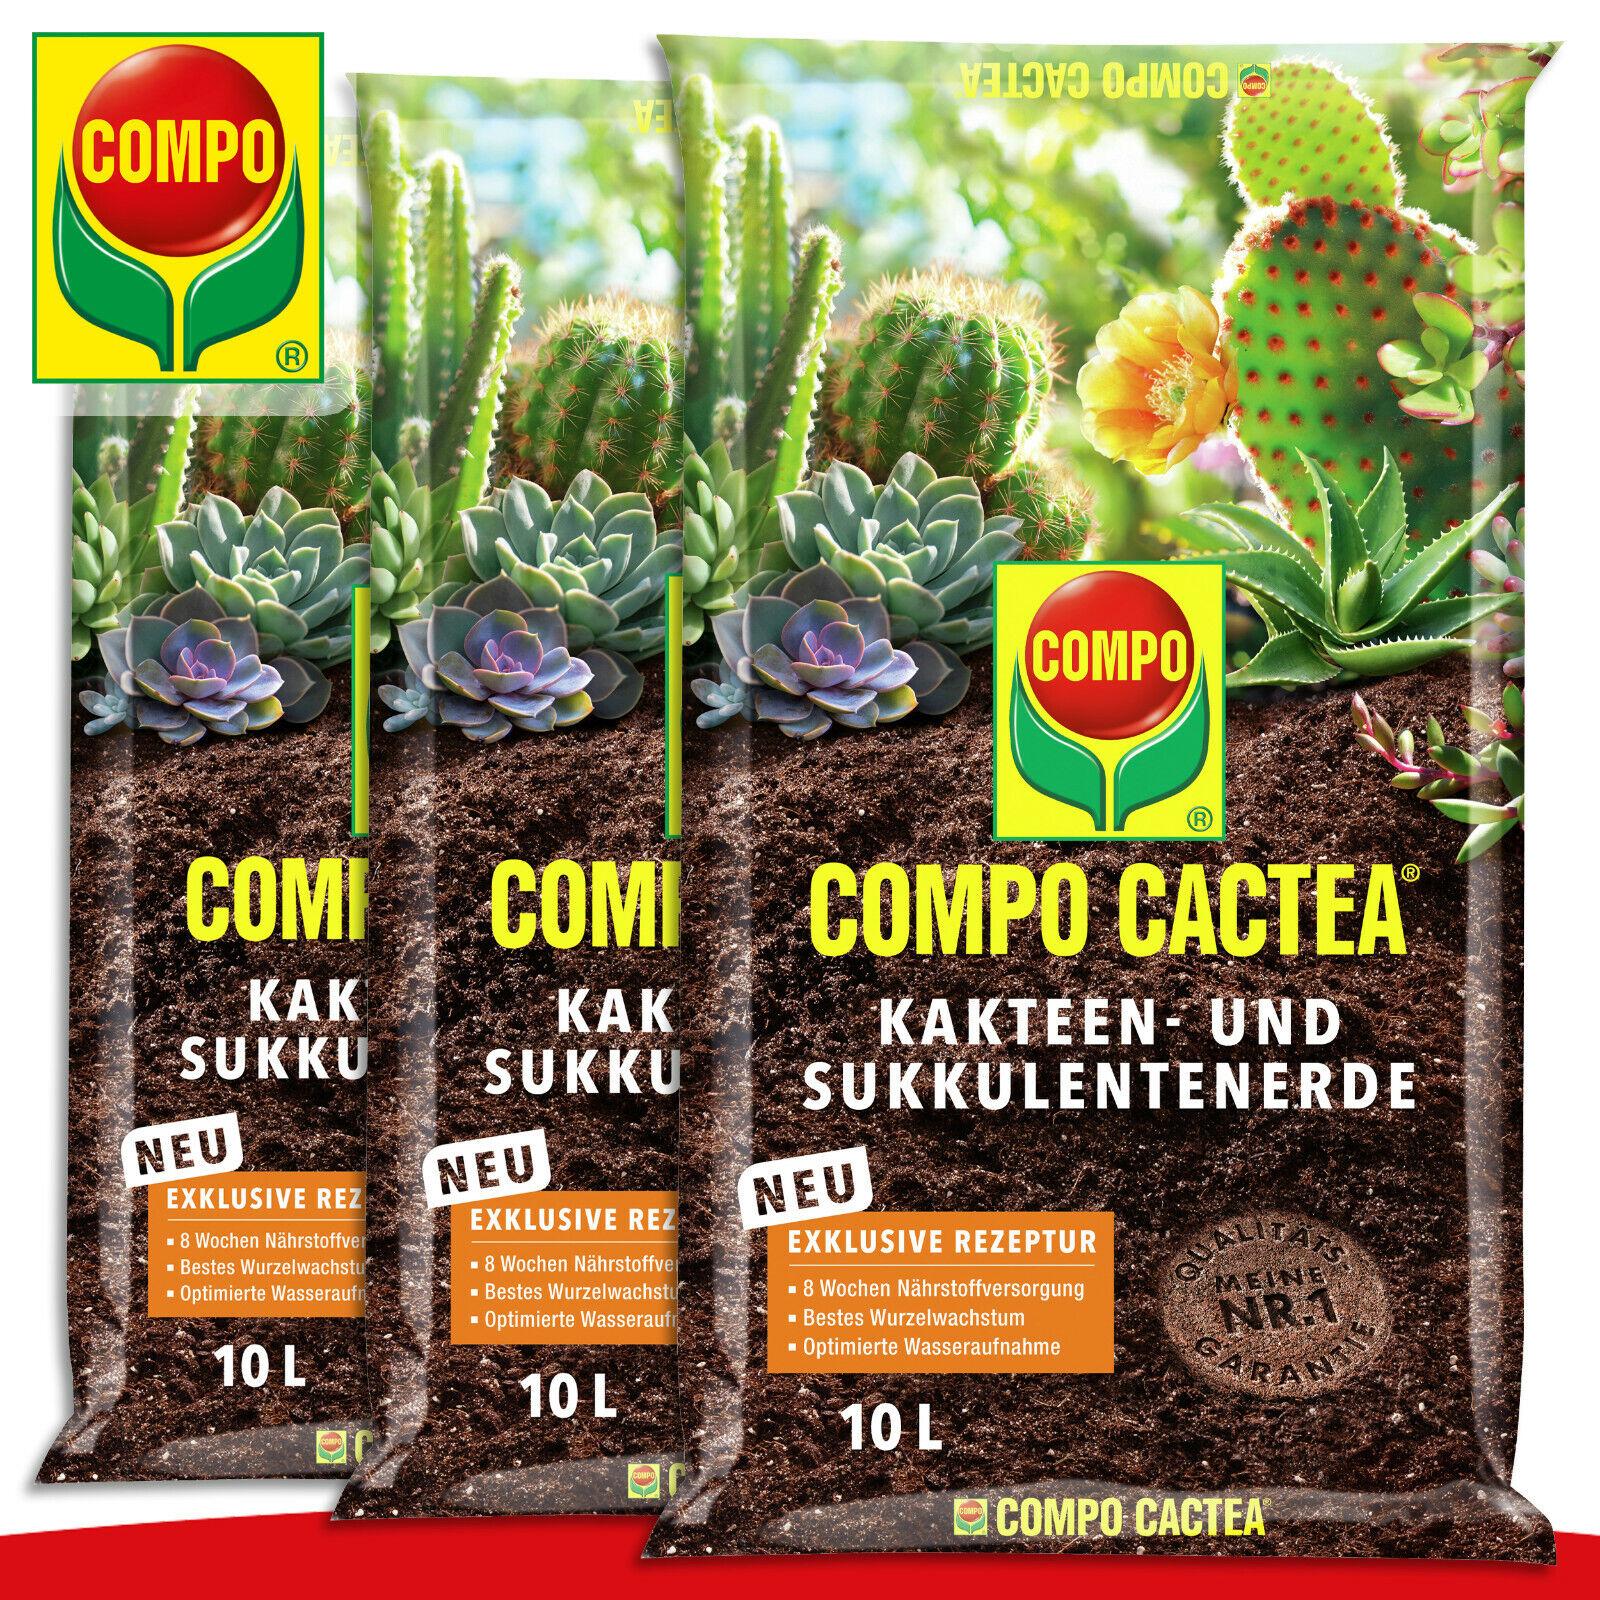 COMPO Cactea 3 x 10 L Cactus And Succulent Plant Soil Grower Growth Minerals